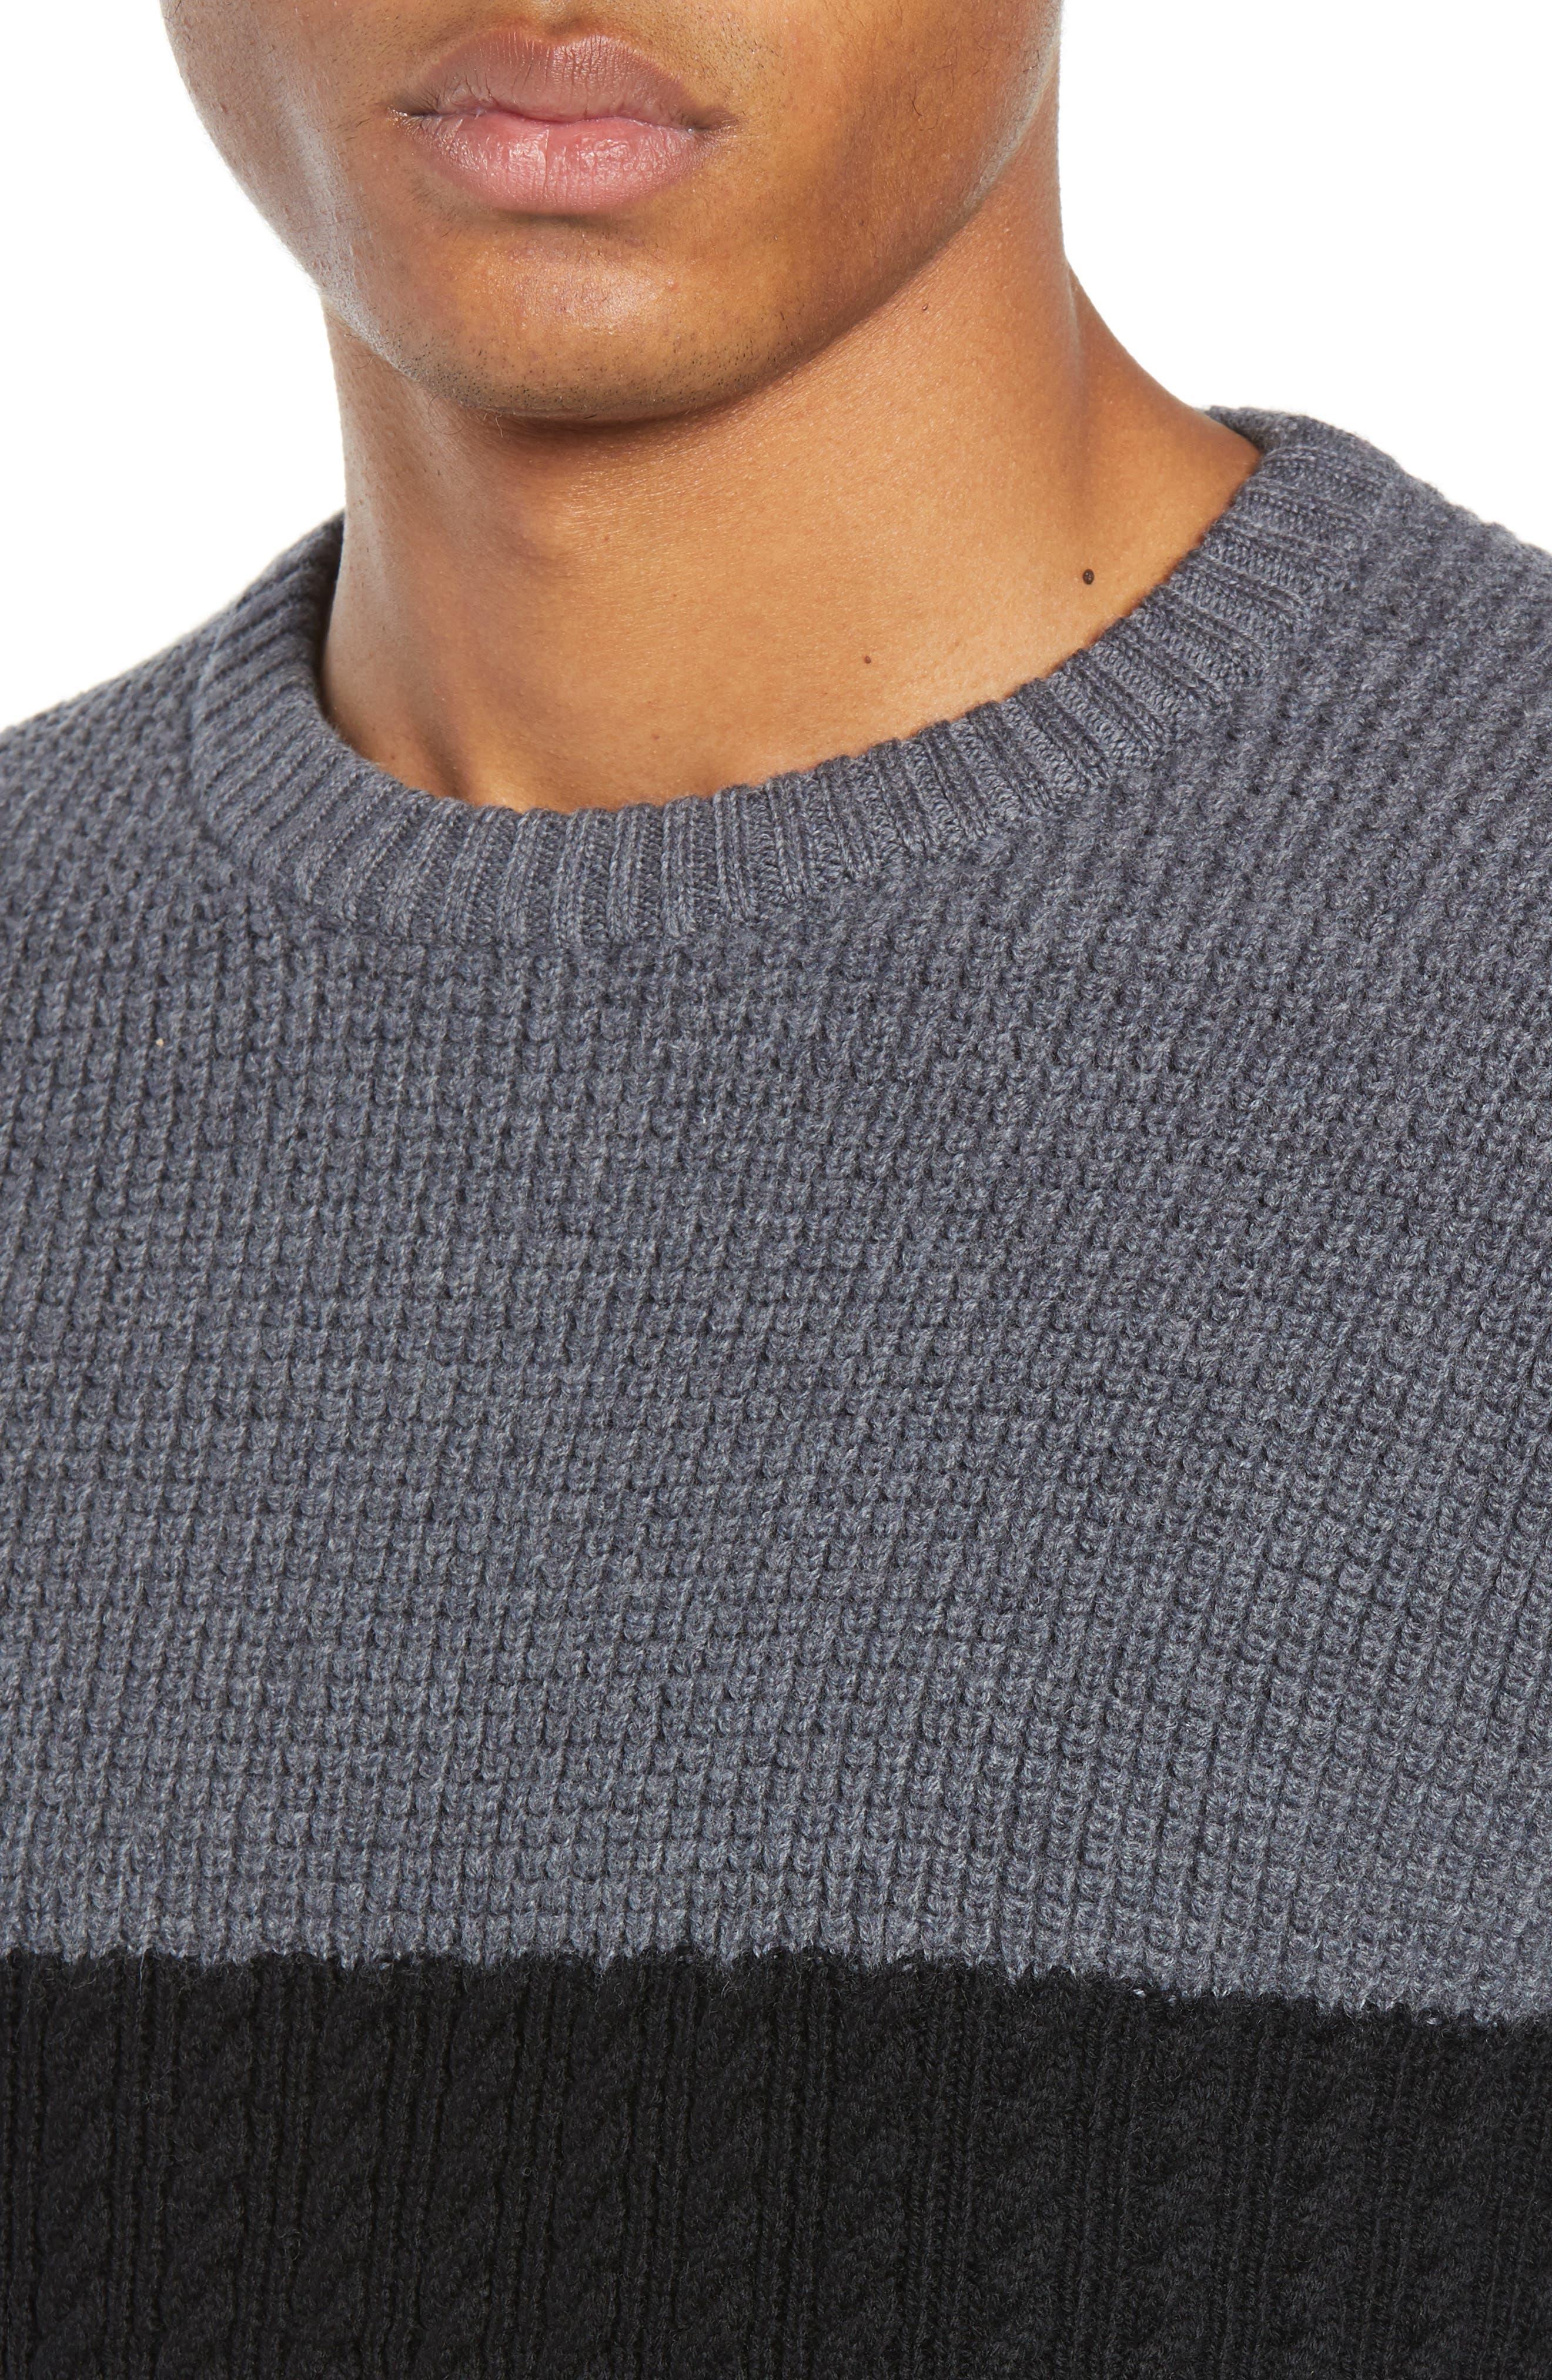 Block Merino Wool Cable Knit Sweater,                             Alternate thumbnail 4, color,                             BLACK CAVIAR COLORBLOCK